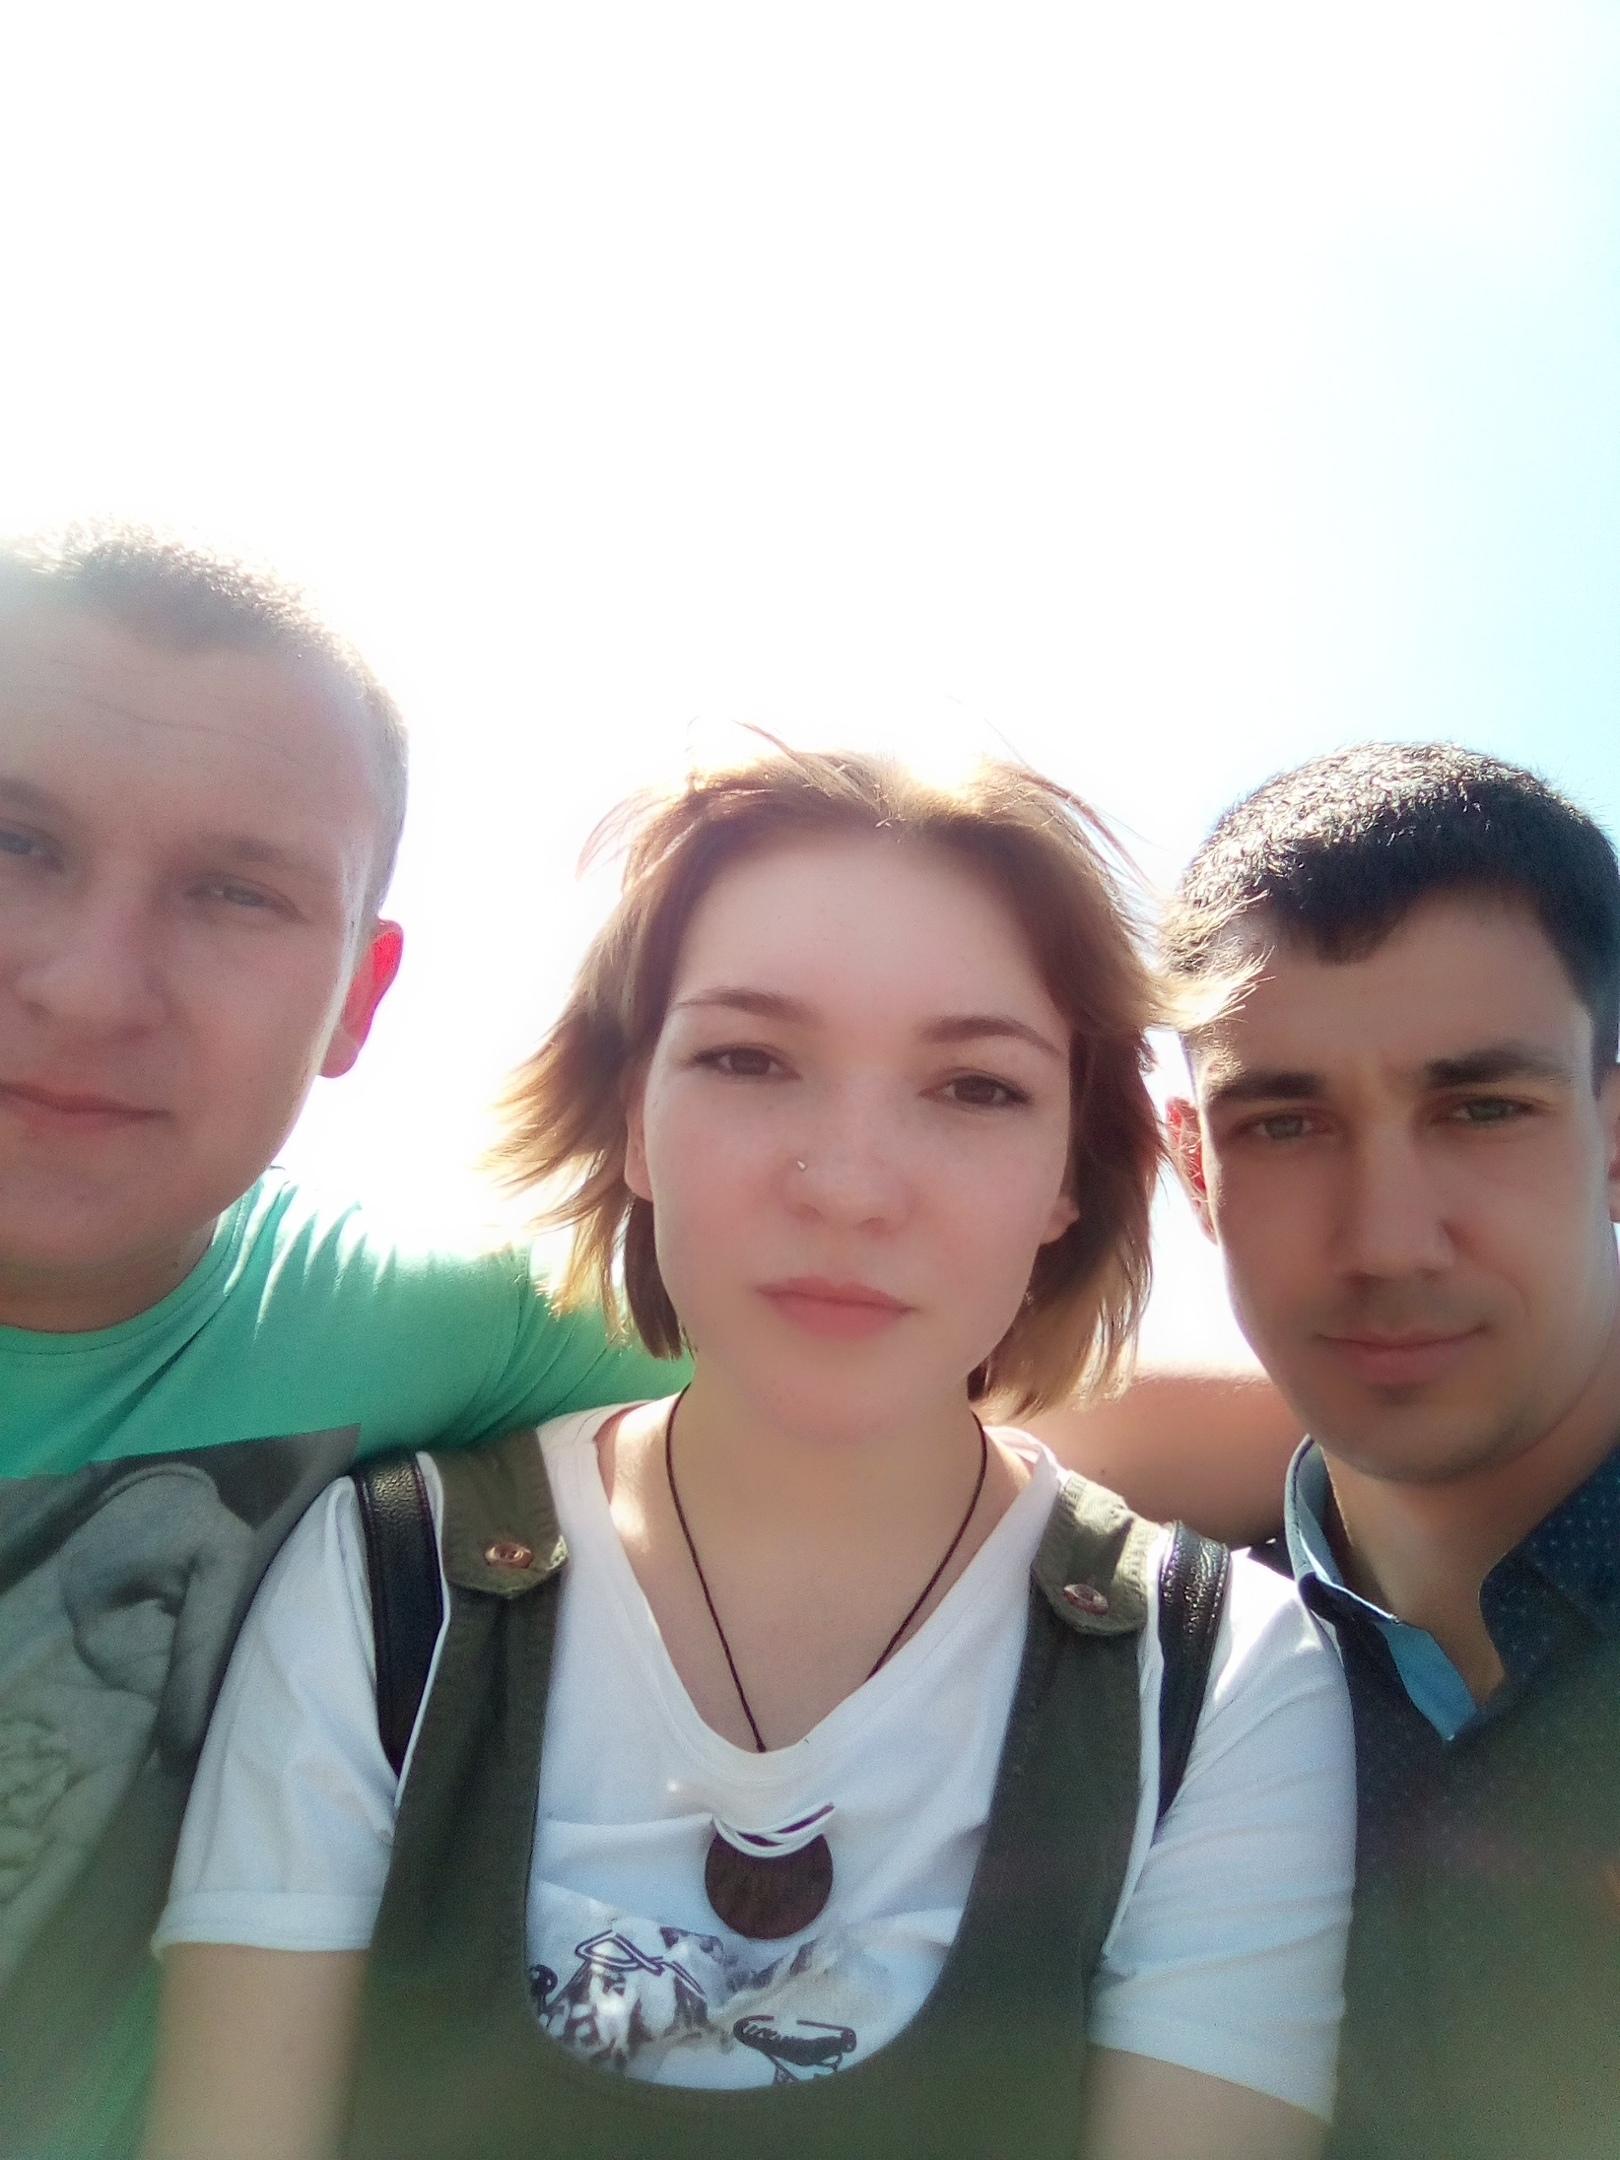 Maksimka, 25, Engel's